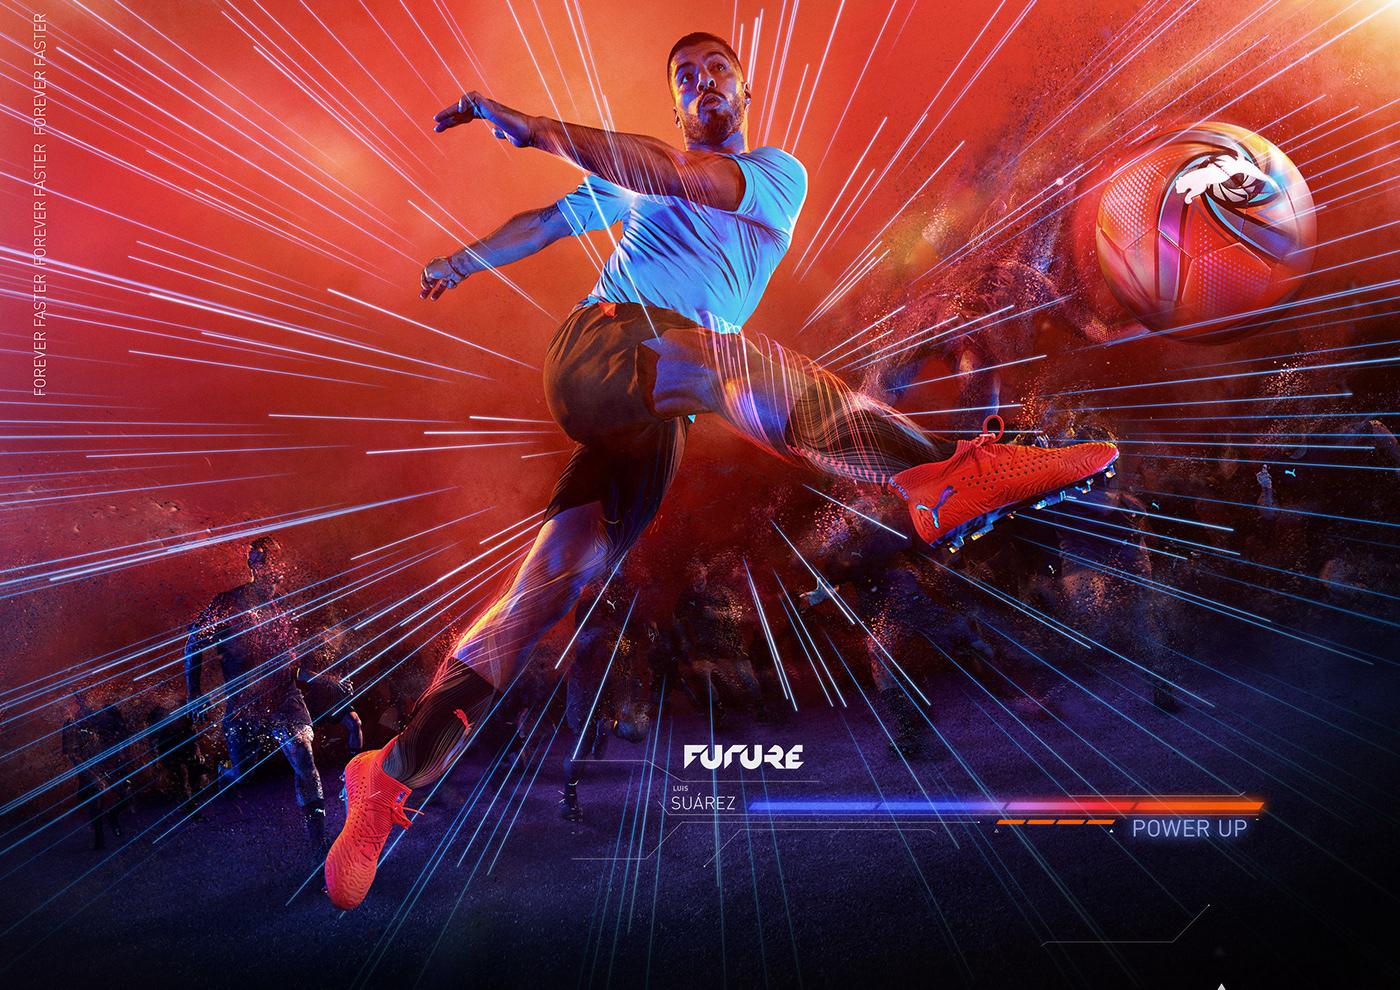 anime cinema4d football Gaming puma Render soccer sport videogame visualfx